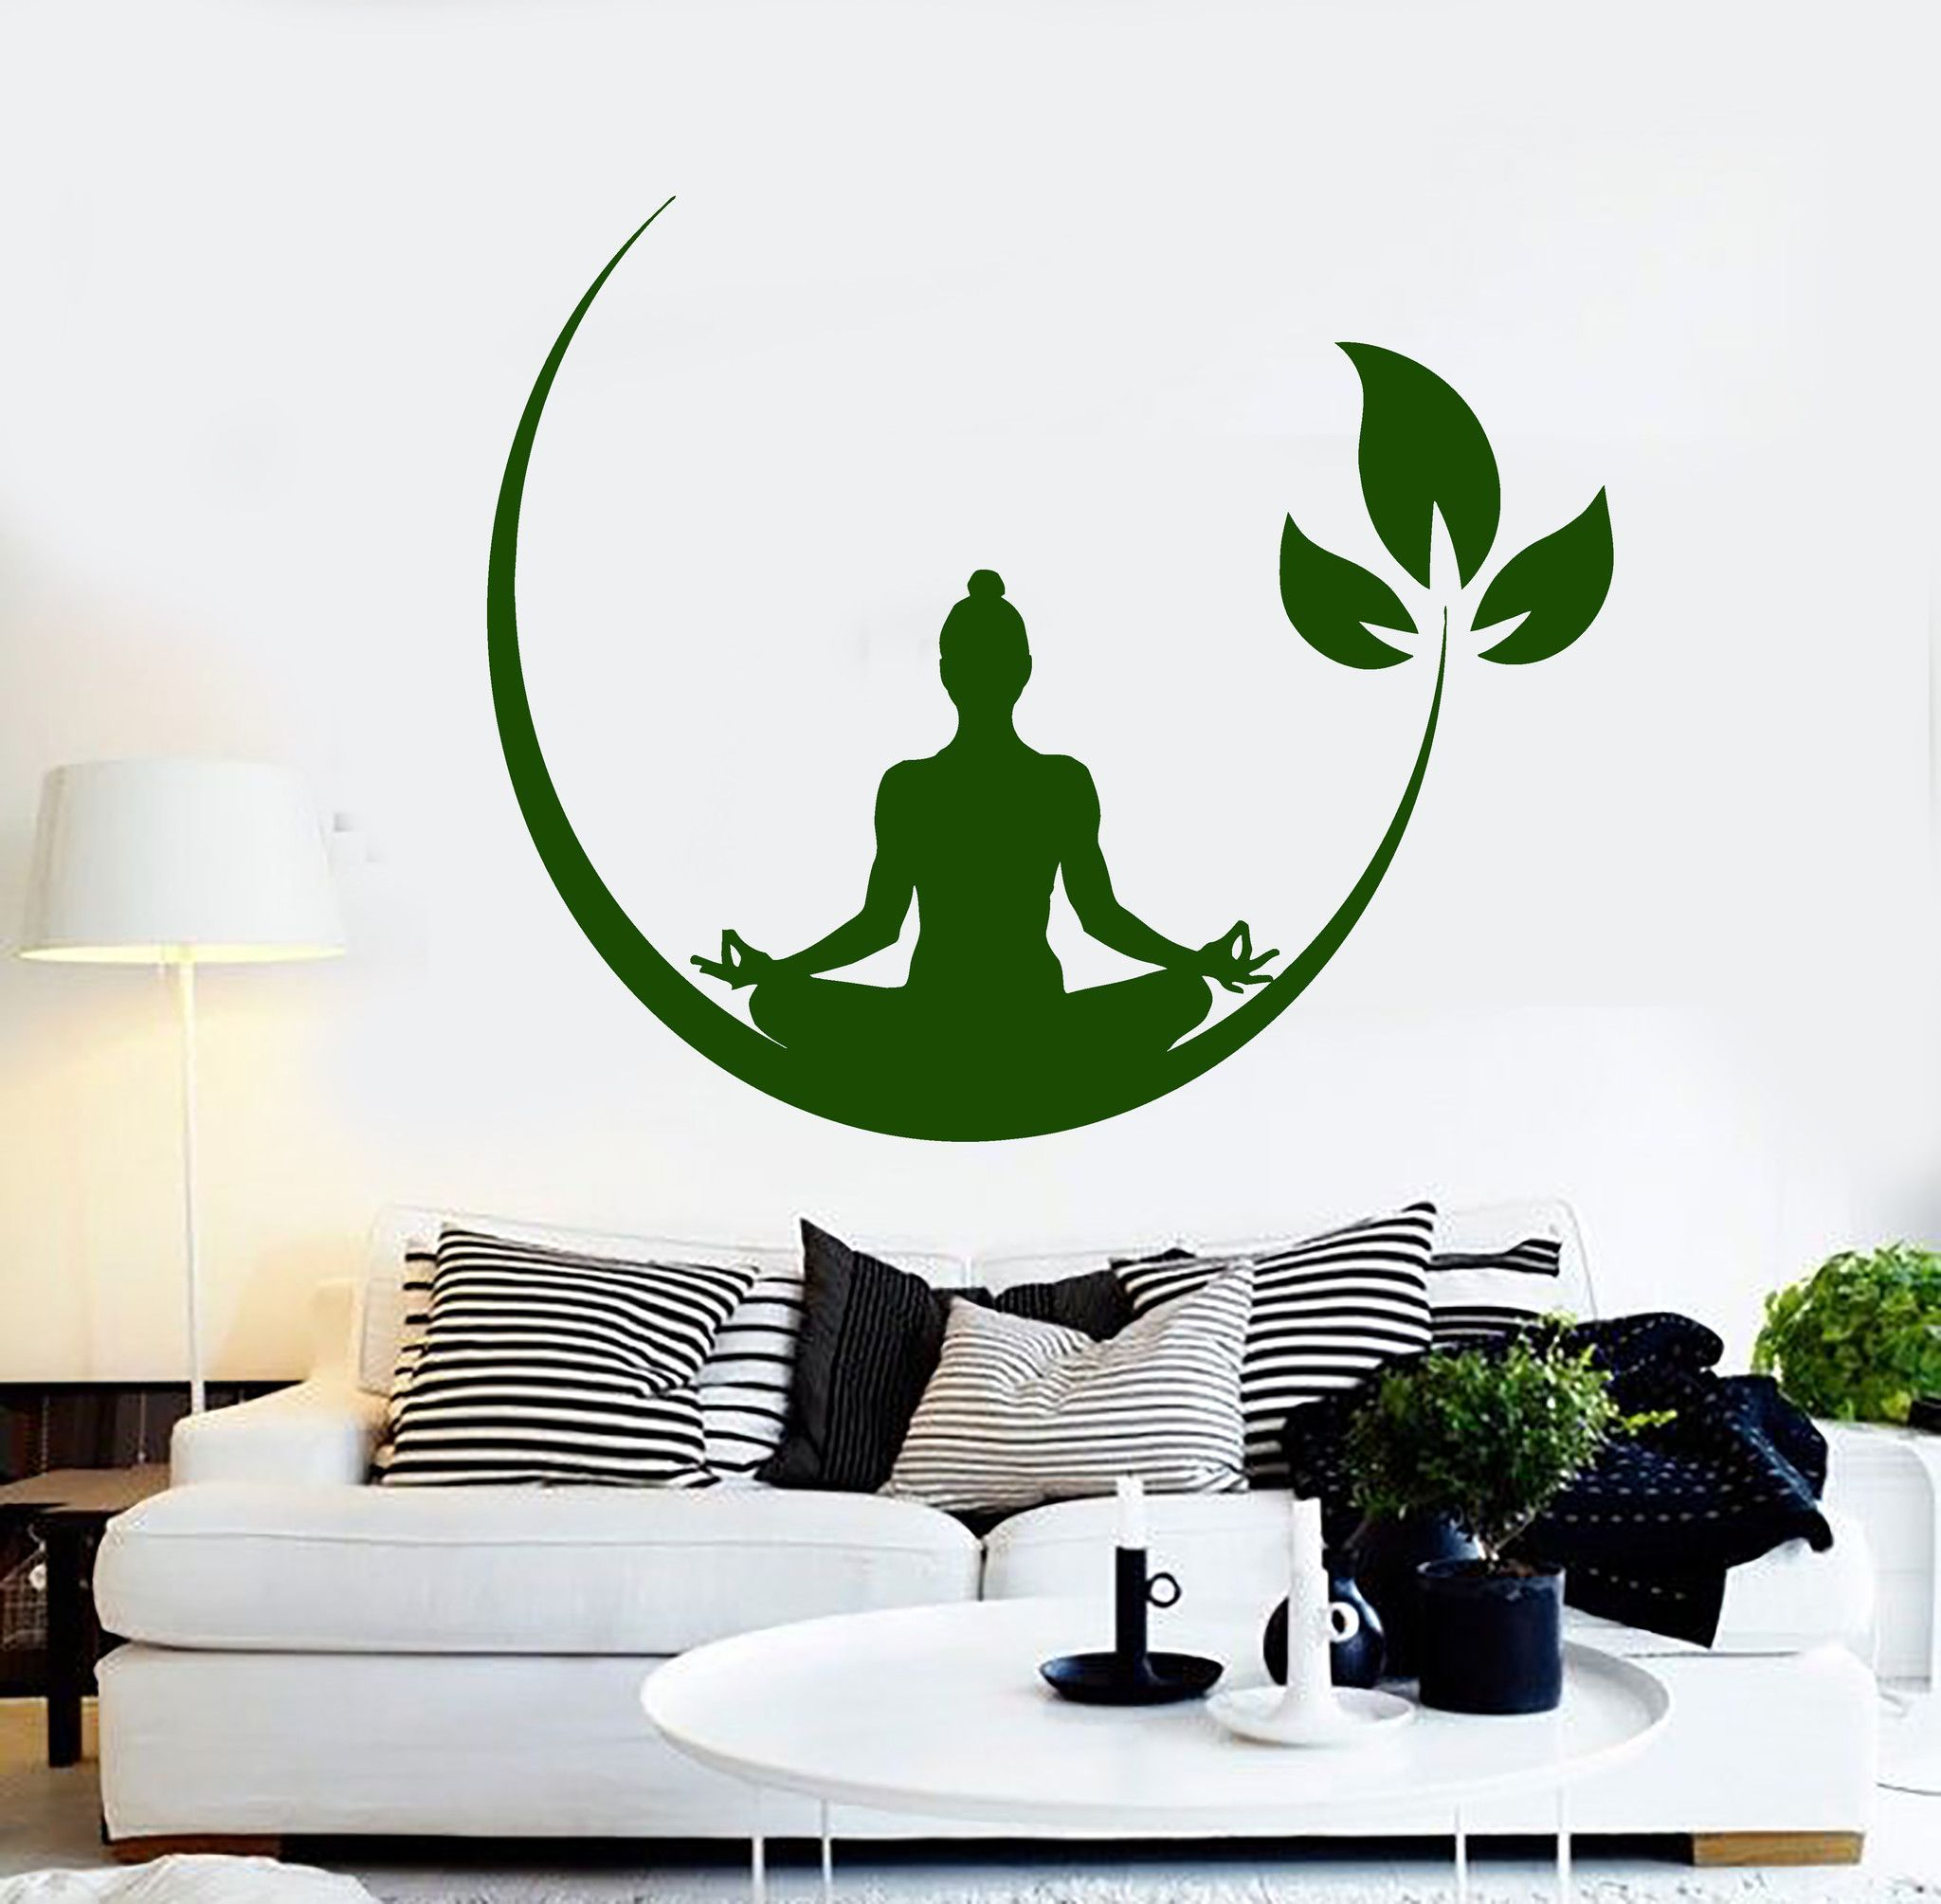 Vinyl Wall Decal Yoga Meditation Room Buddhist Zen Stickers - Zen wall decalsvinyl wall decal yin yang yoga zen meditation bedroom decor